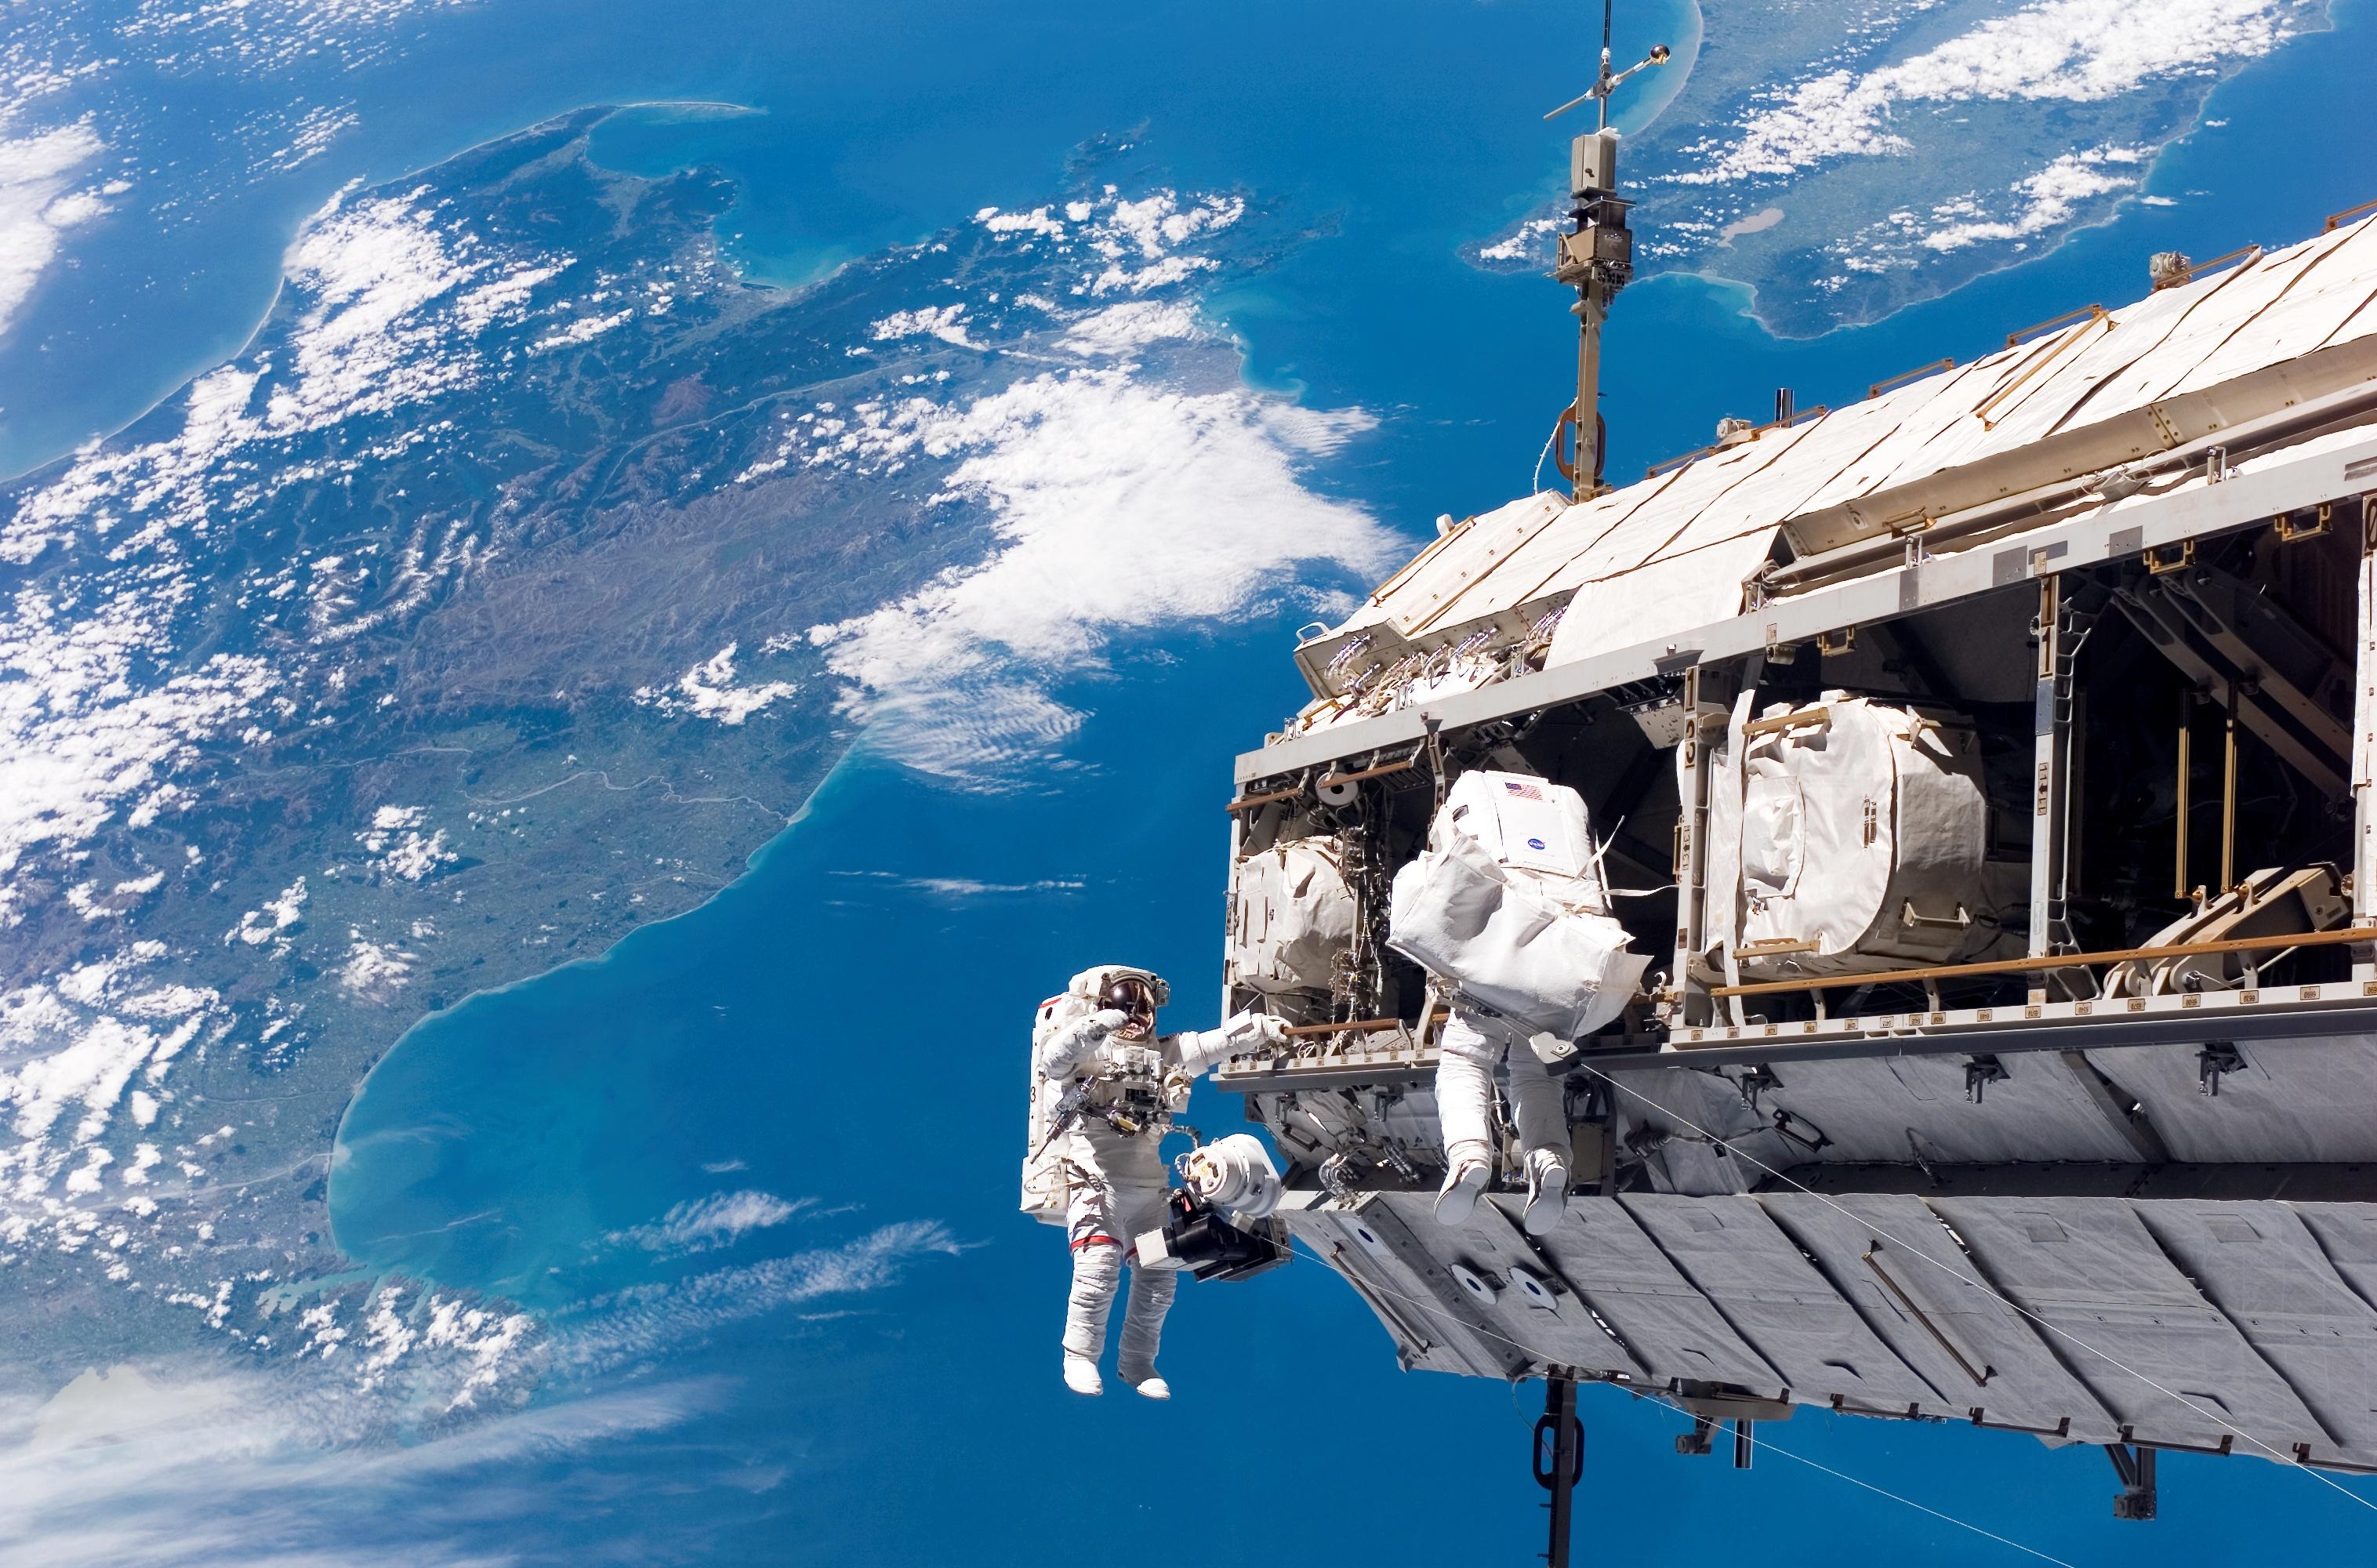 A pic taken while a real Spacewalk